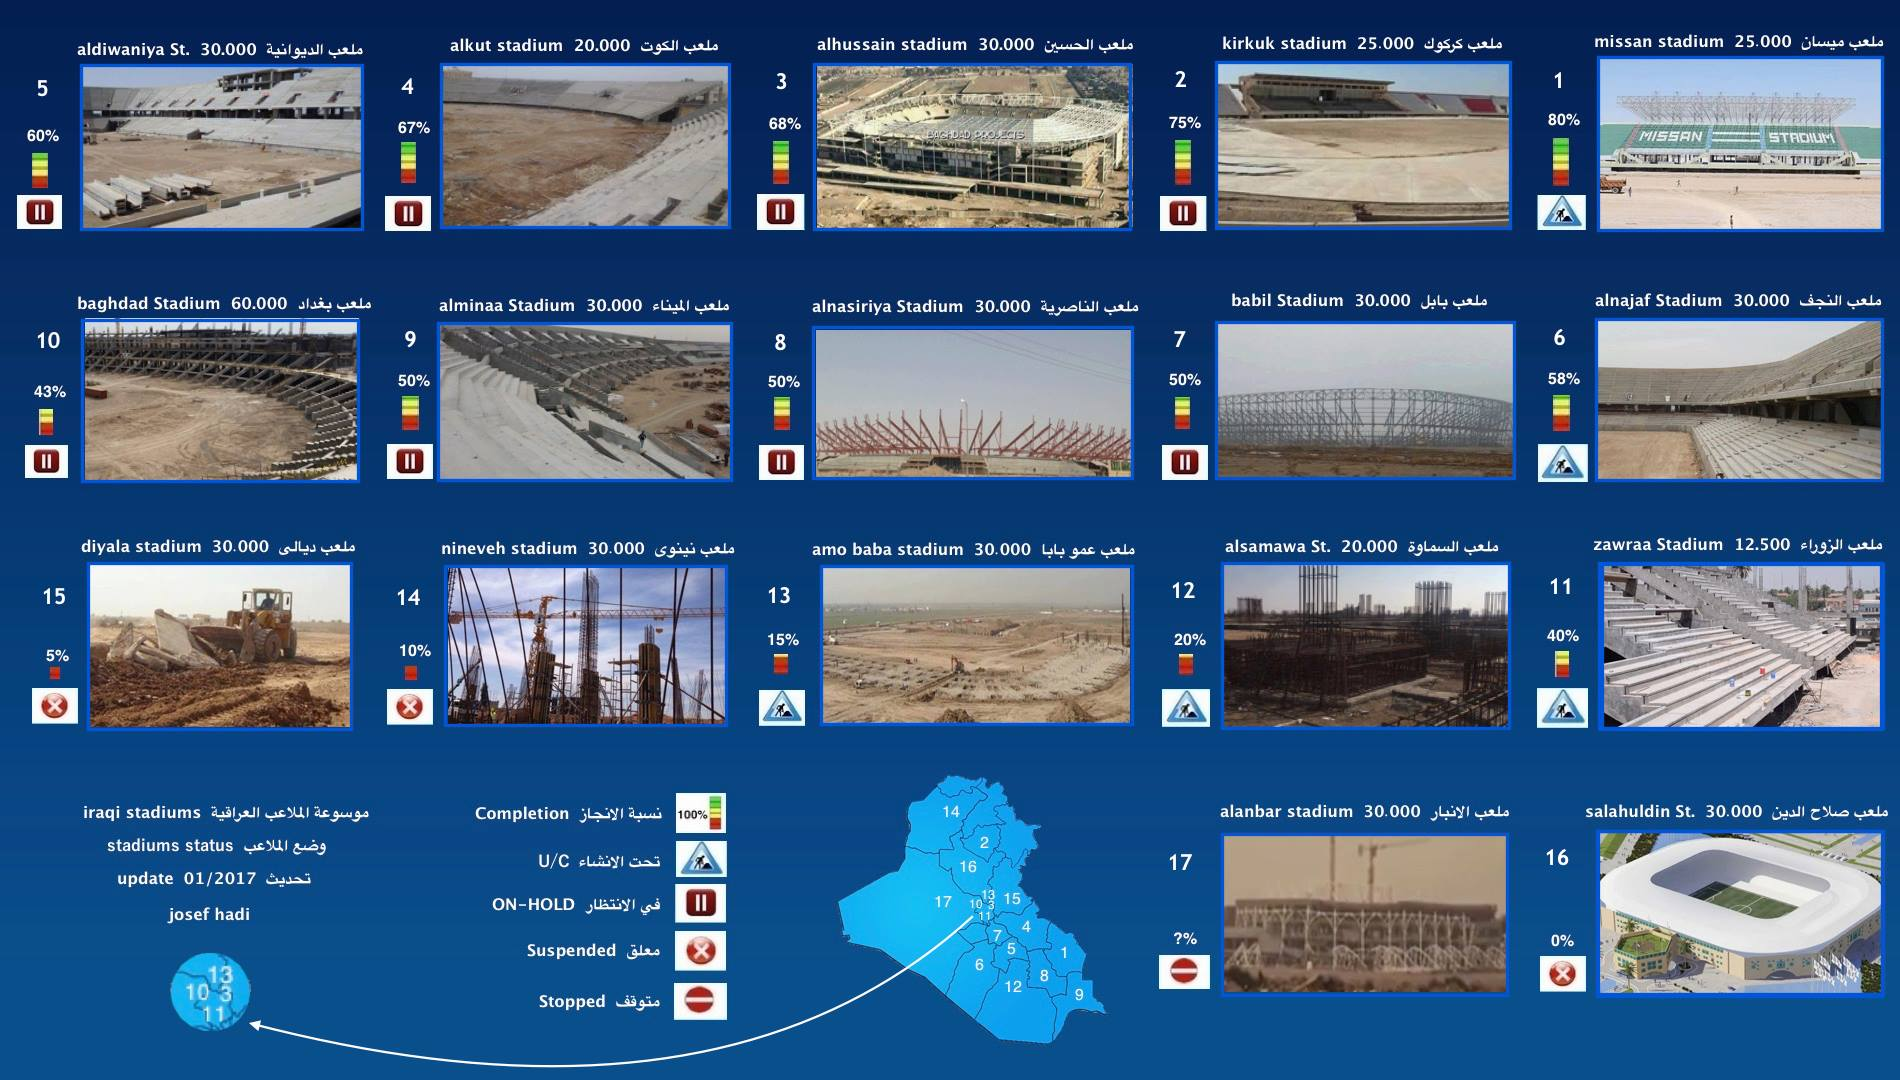 Focusing on Iraq's stadium project